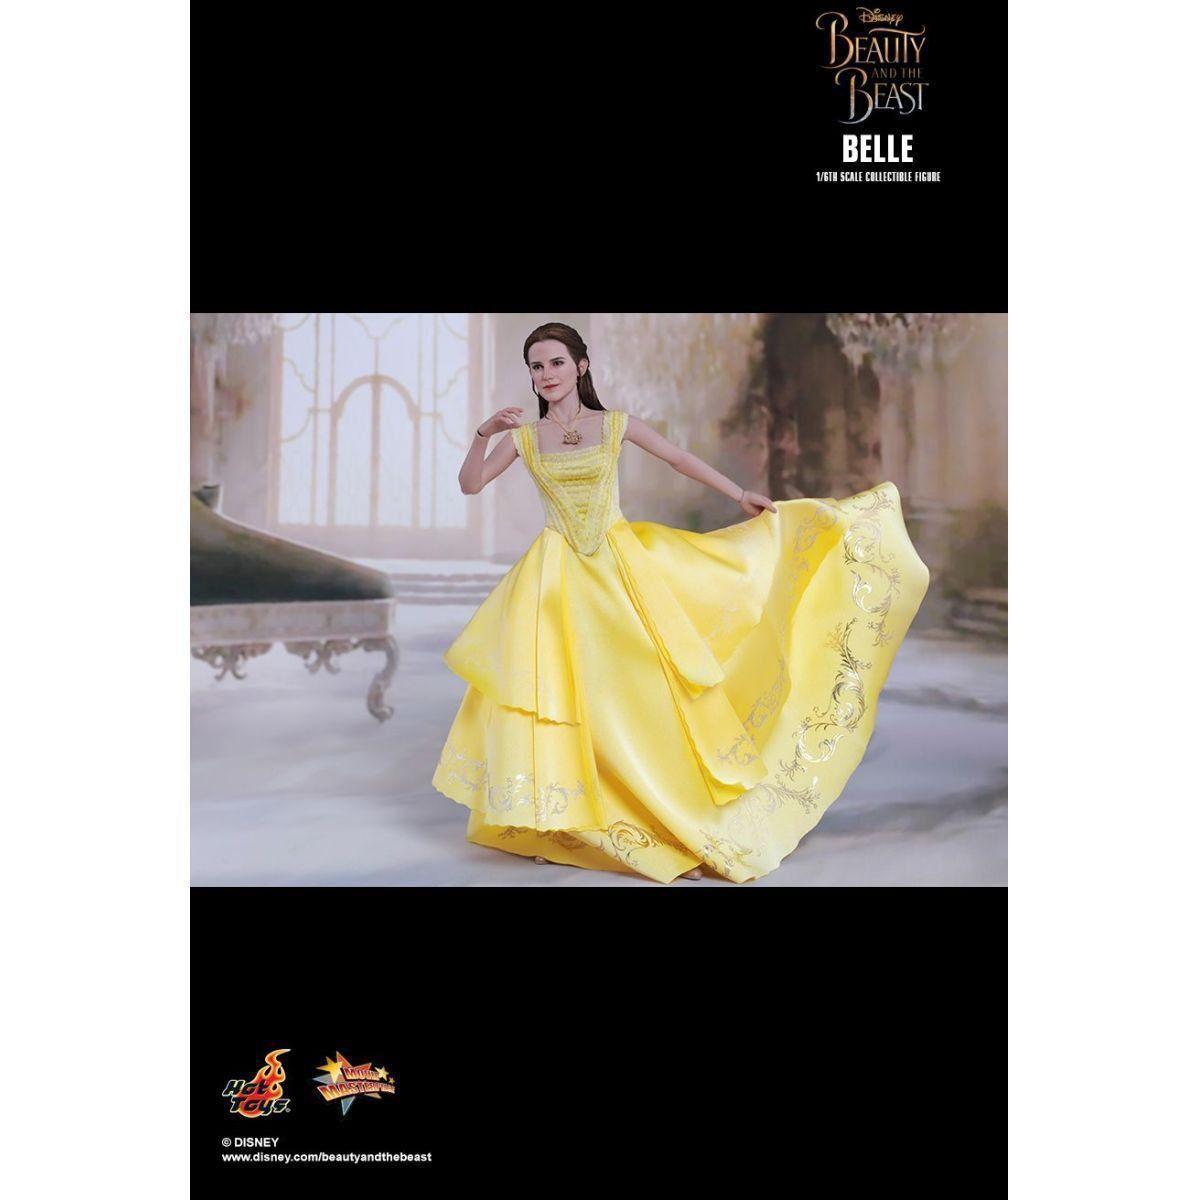 PRÉ VENDA: Boneco Bela (Belle): A Bela e a Fera Movie Masterpiece Escala 1/6 - Hot Toys